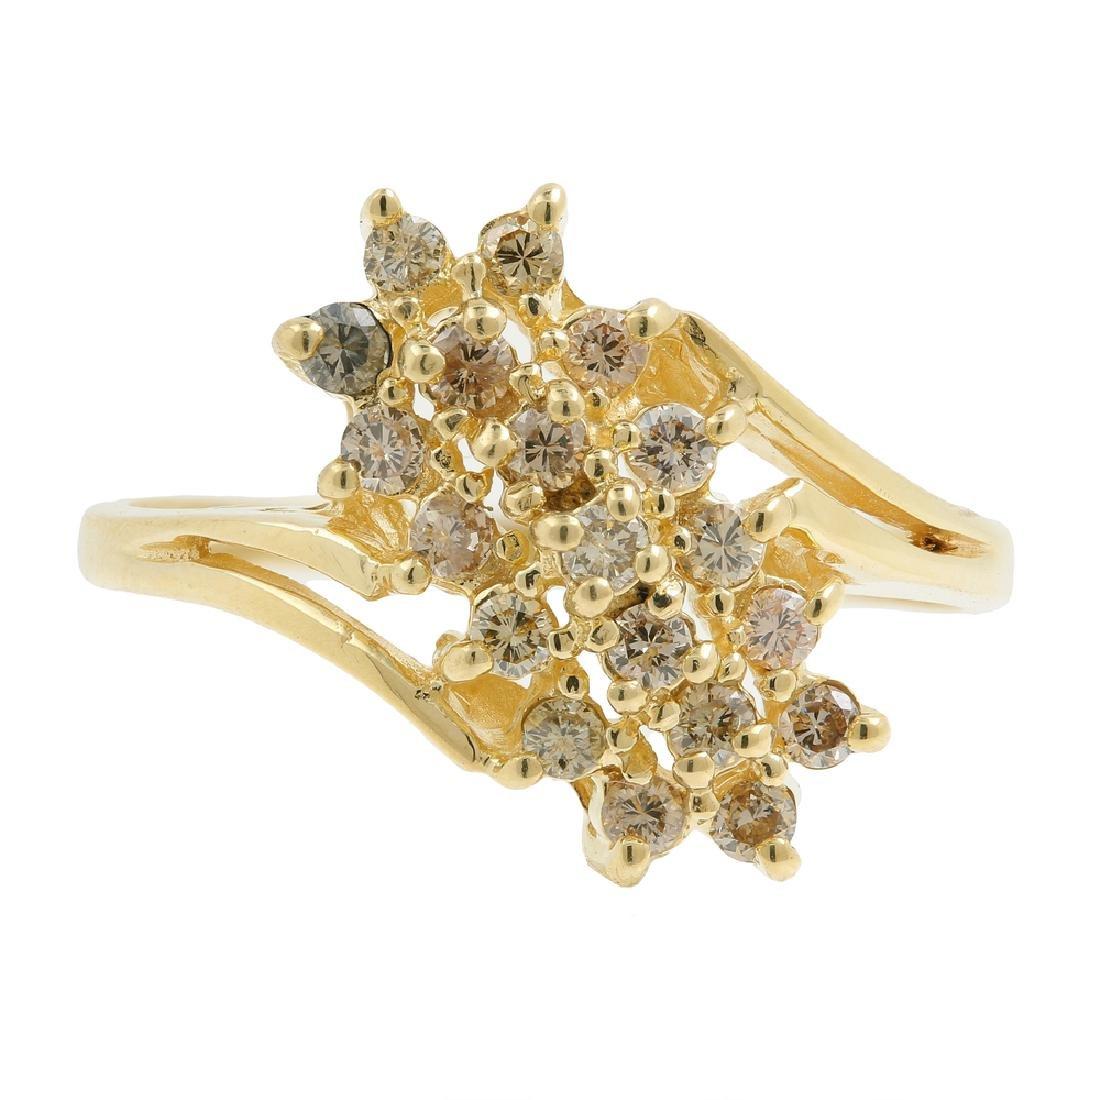 Classic Estate Ladies 14K Yellow Gold Diamond Cluster